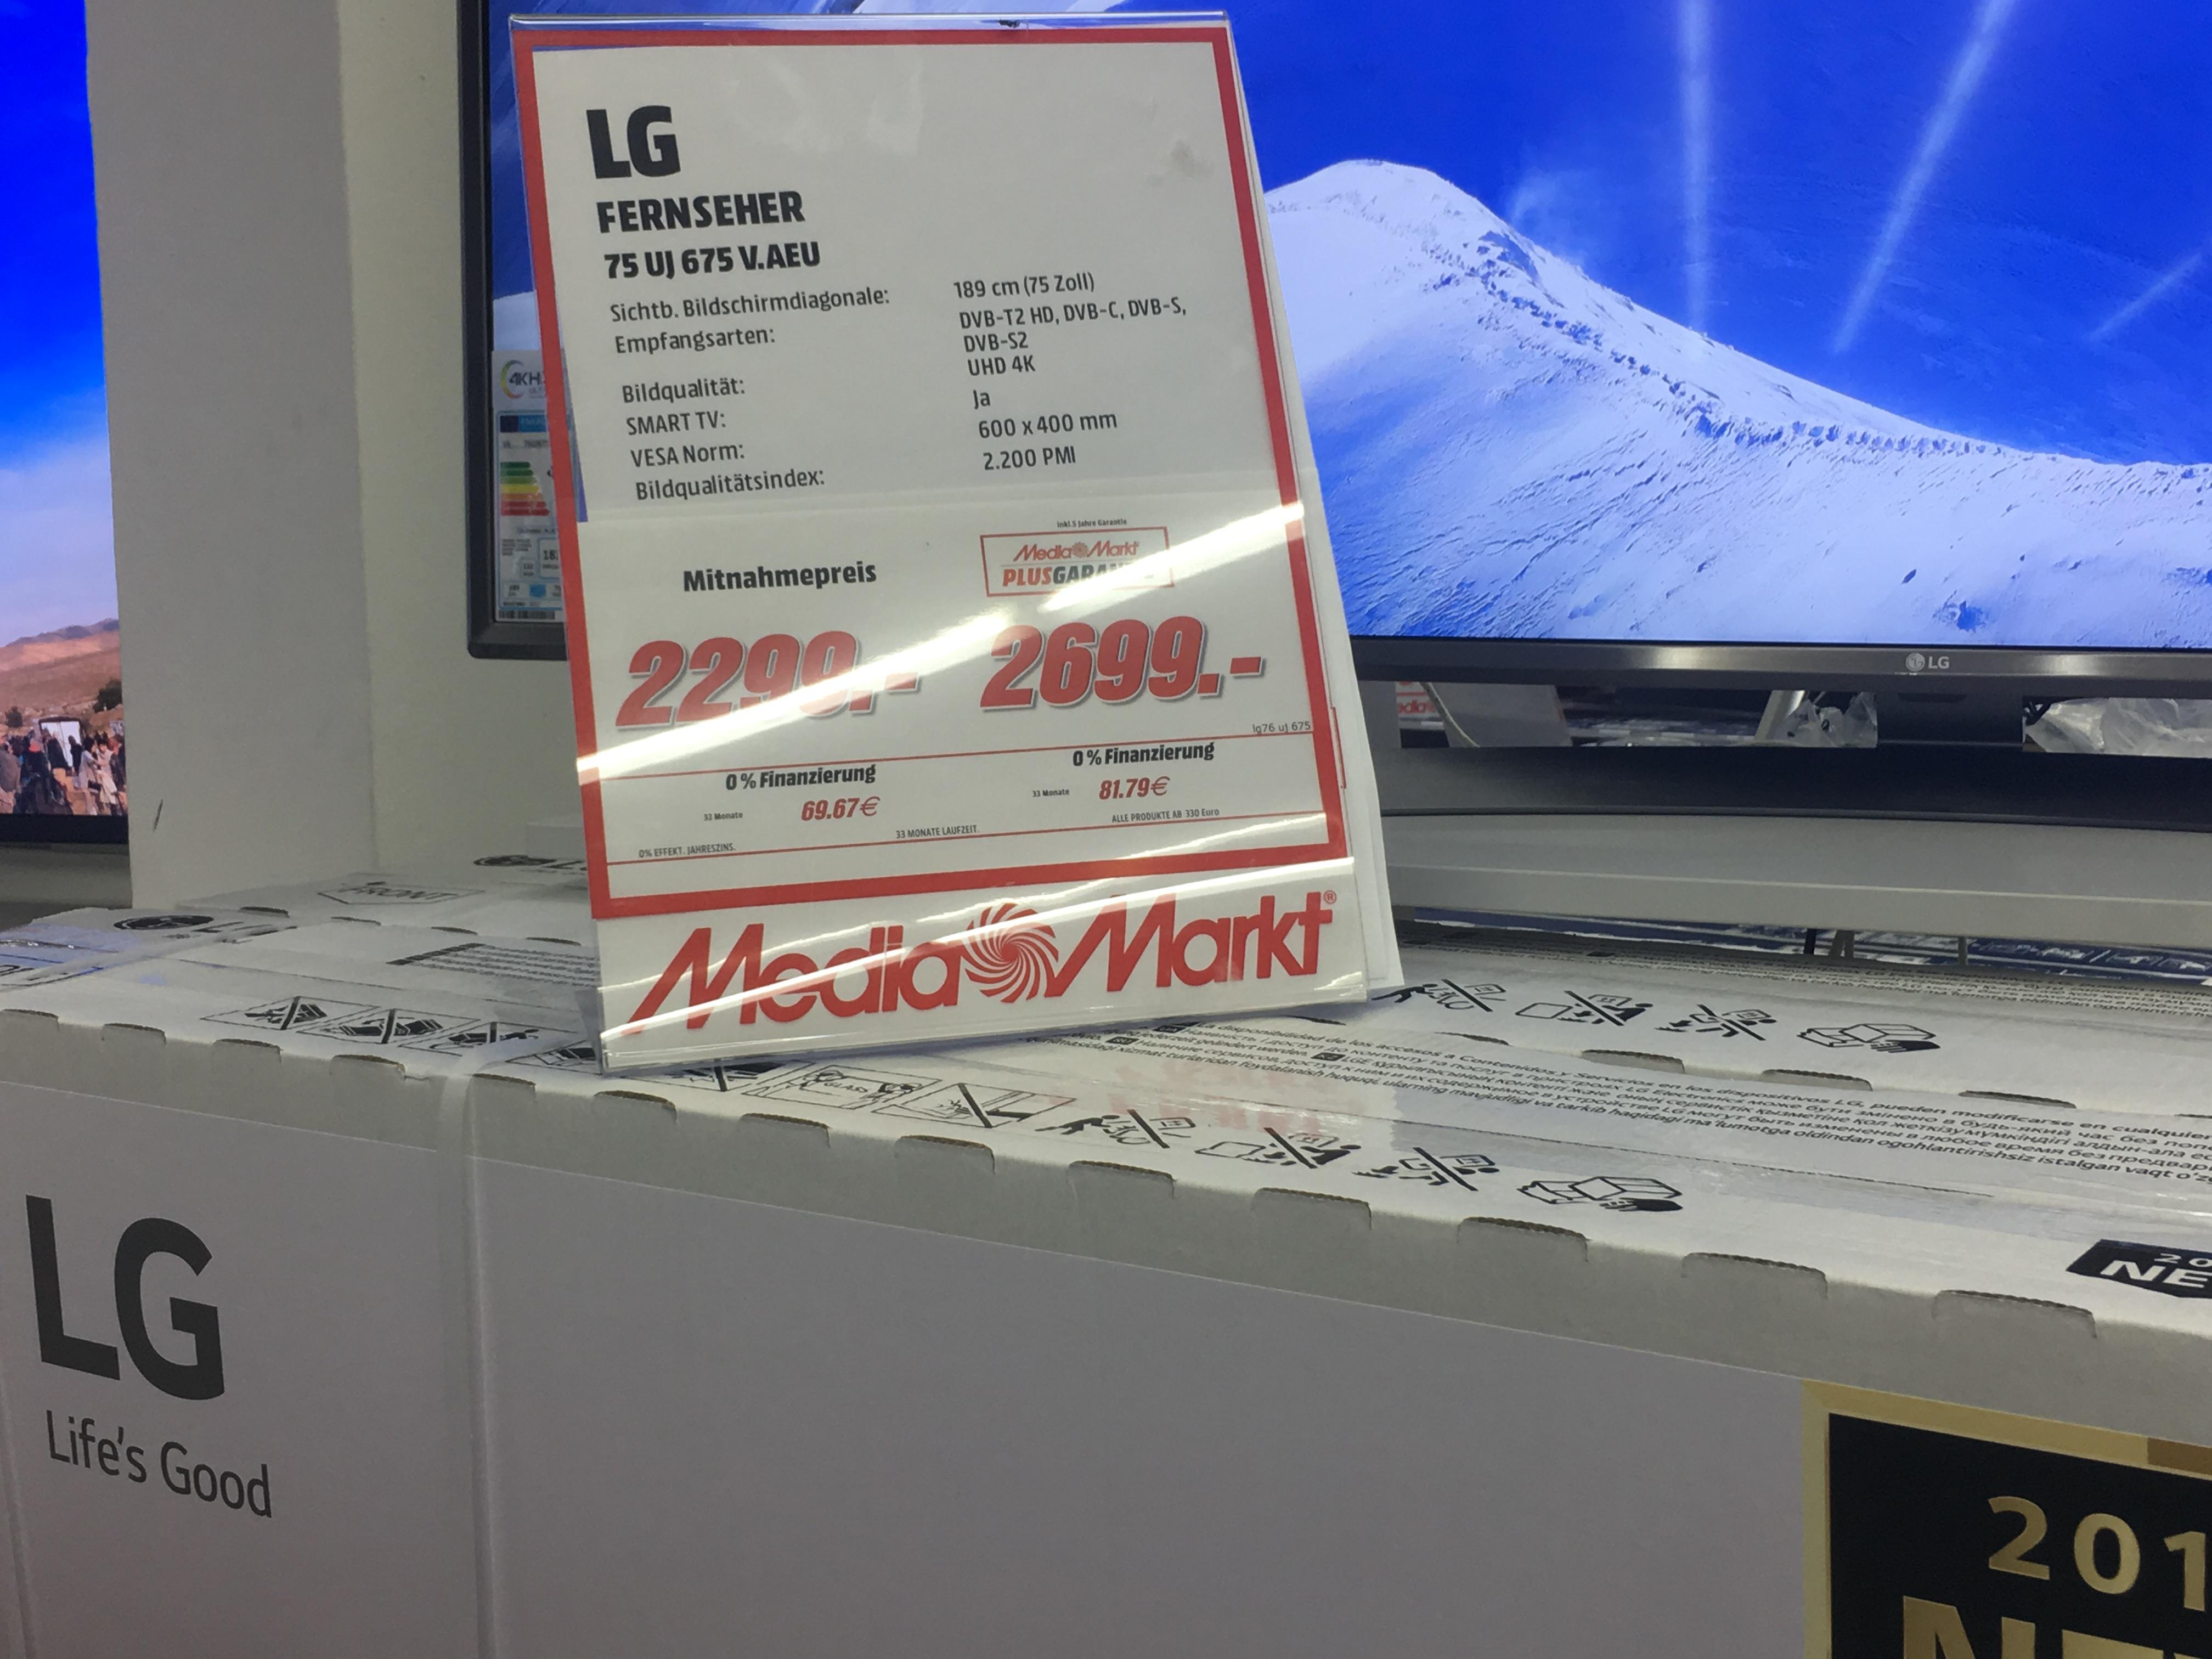 LG 75 UJ 675 V  198cm (75 Zoll) Fernseher (Ultra HD, Smart TV) LOKAL Media Markt Würzburg [Energieklasse A+]